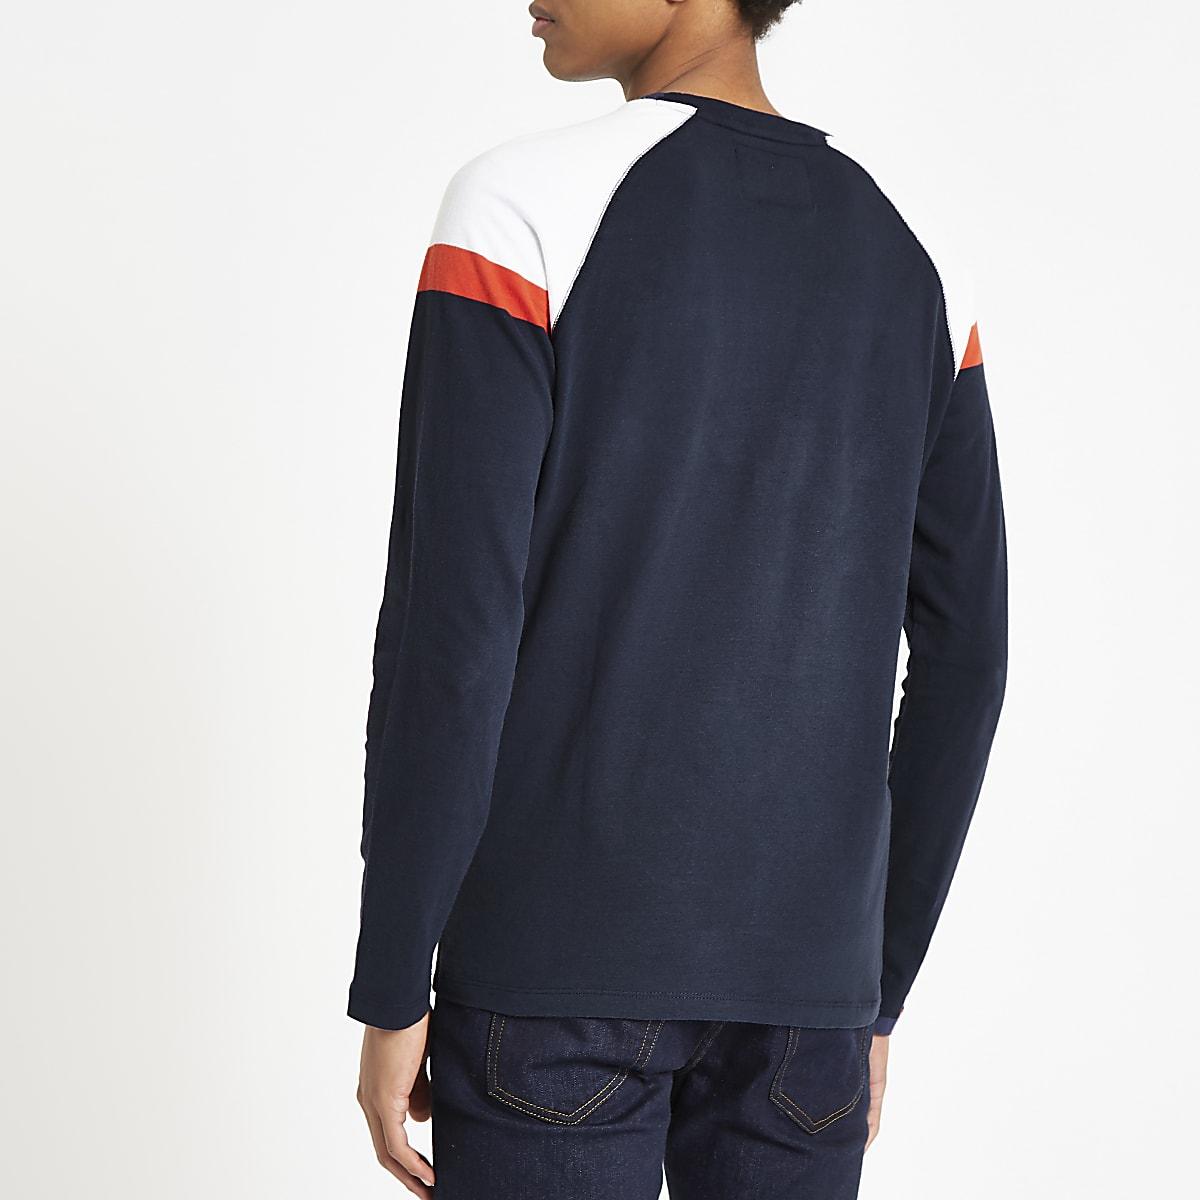 7d62578f7b9 Superdry navy long sleeve T-shirt